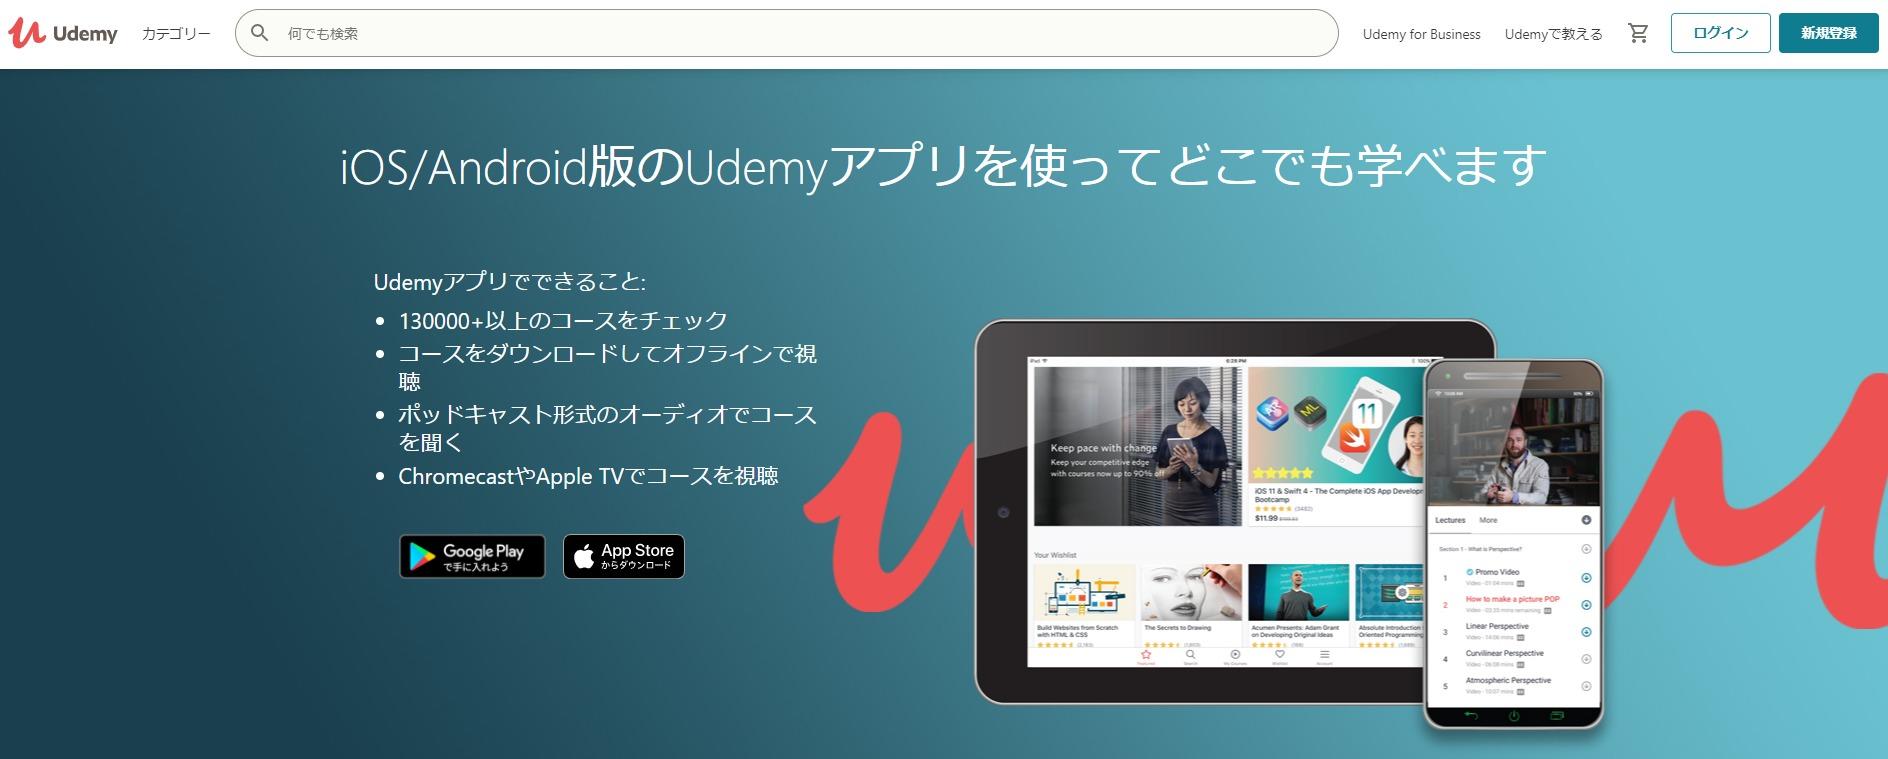 Udemy公式サイト